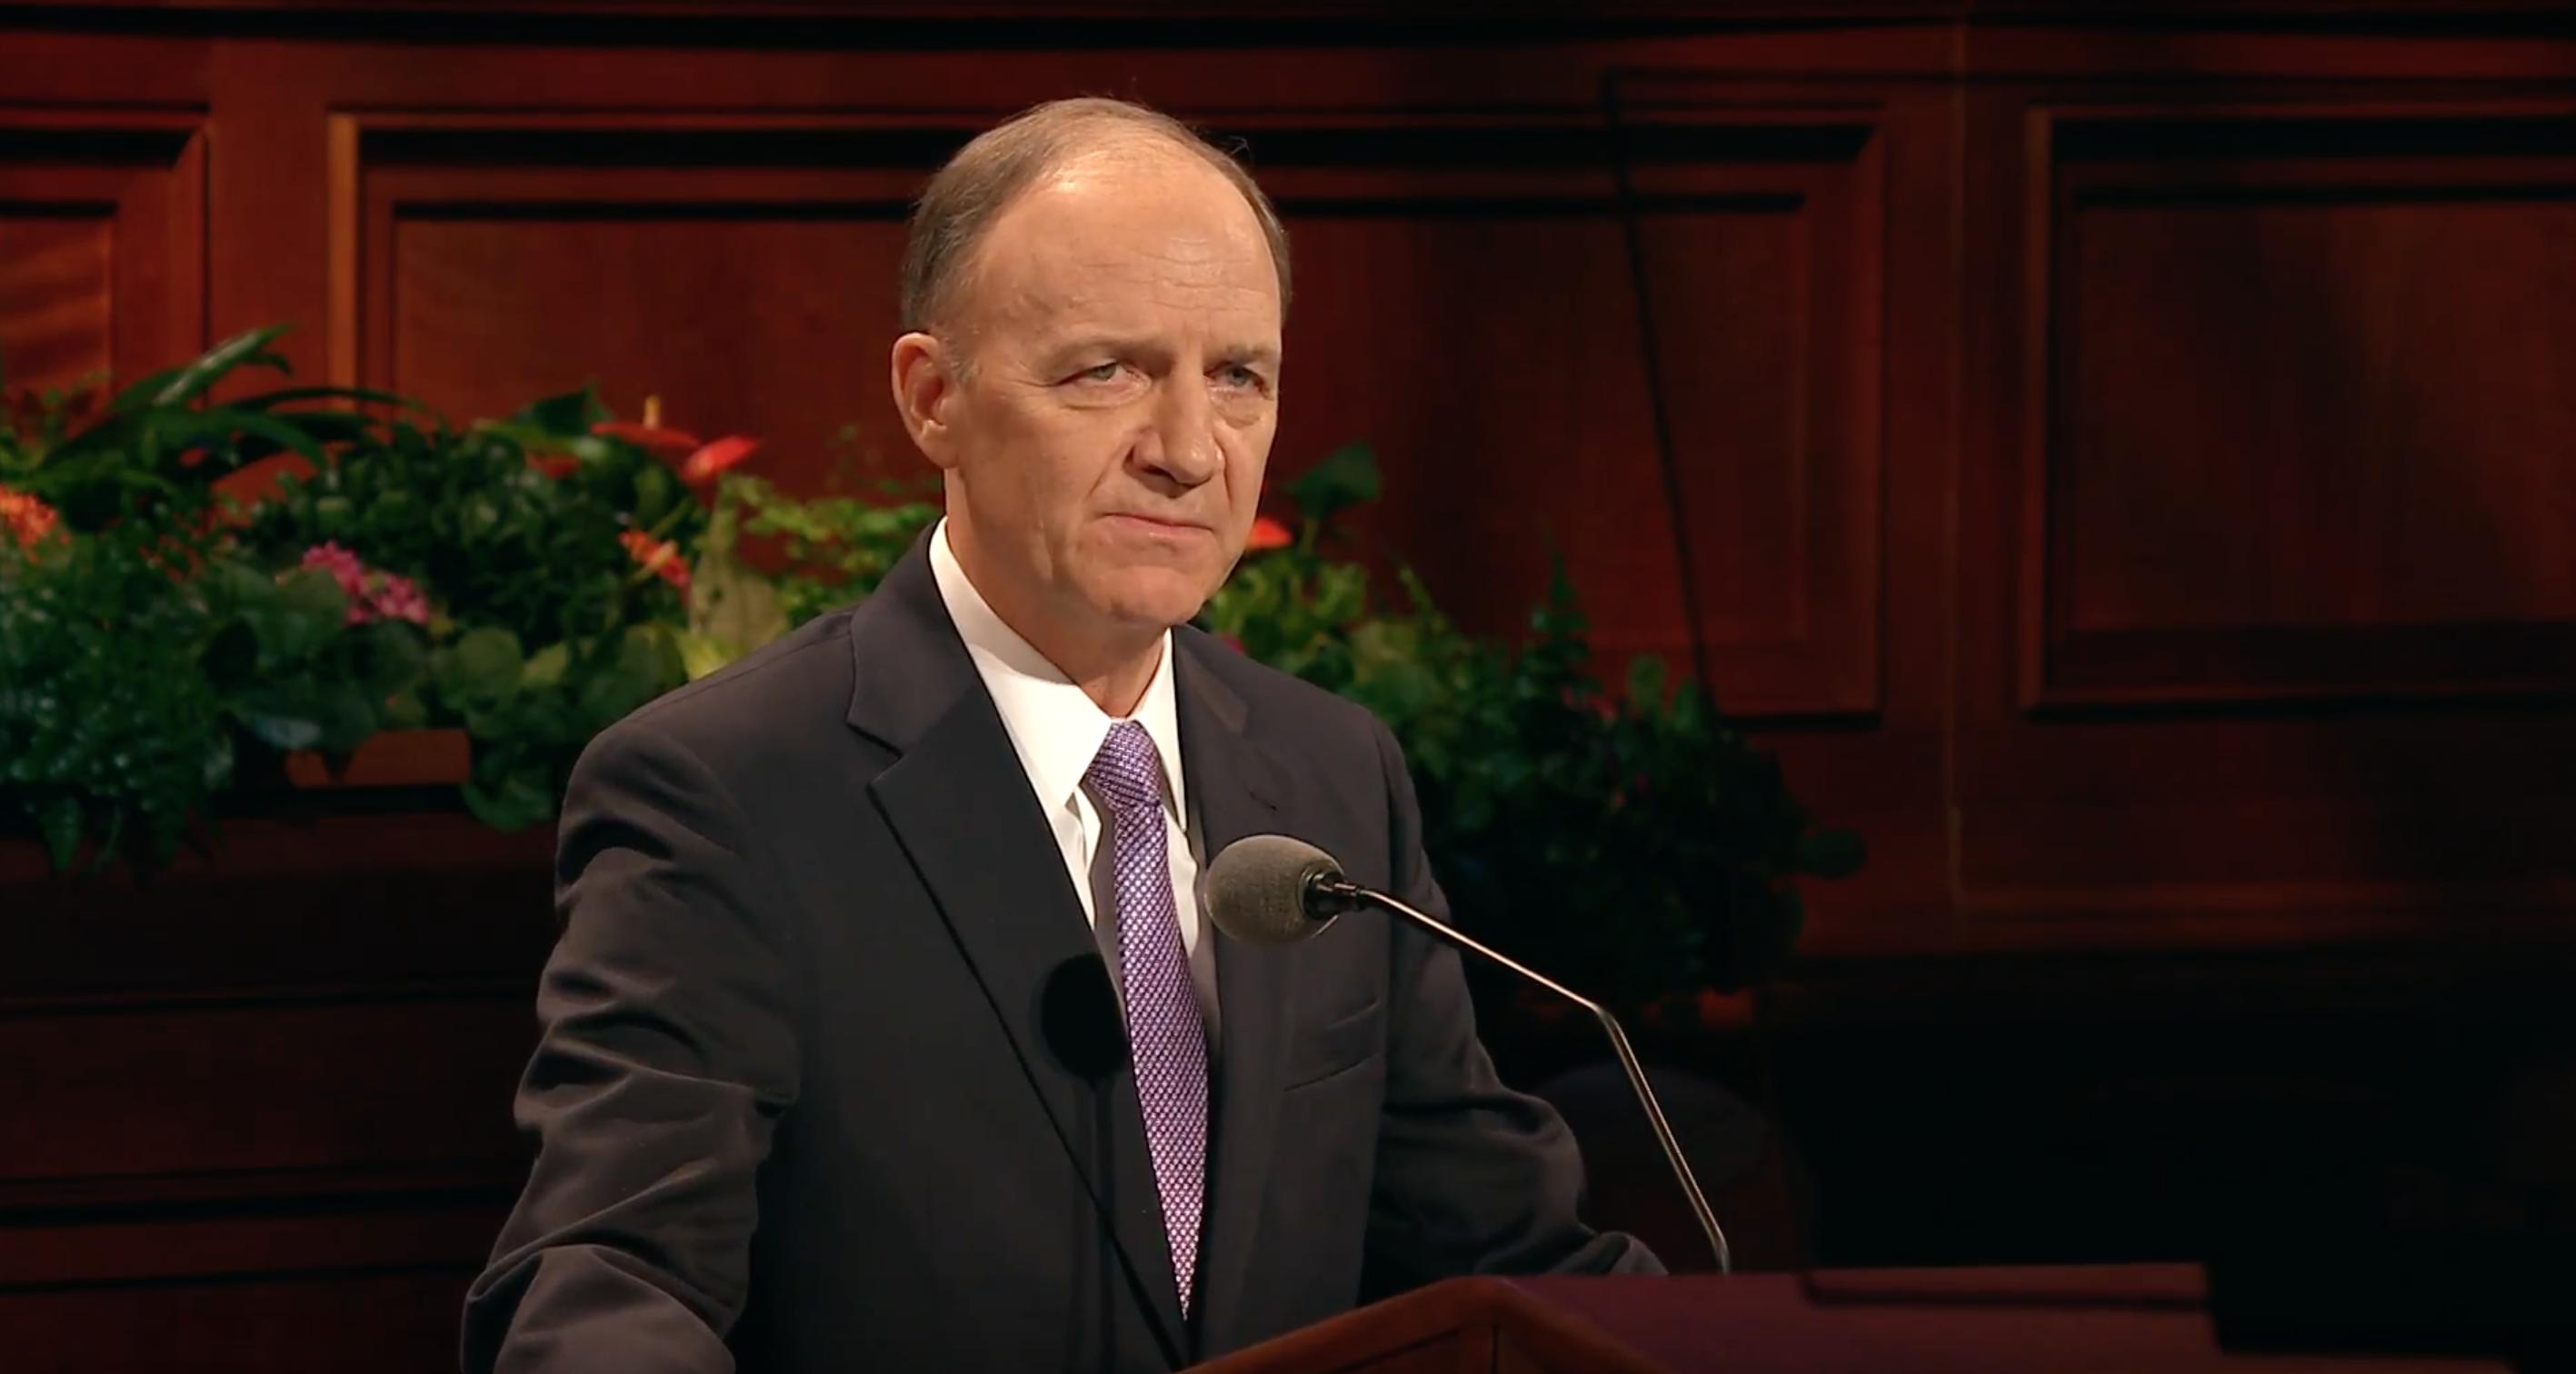 Elder Paul B. Pieper delivers an address in October 2018 general conference.